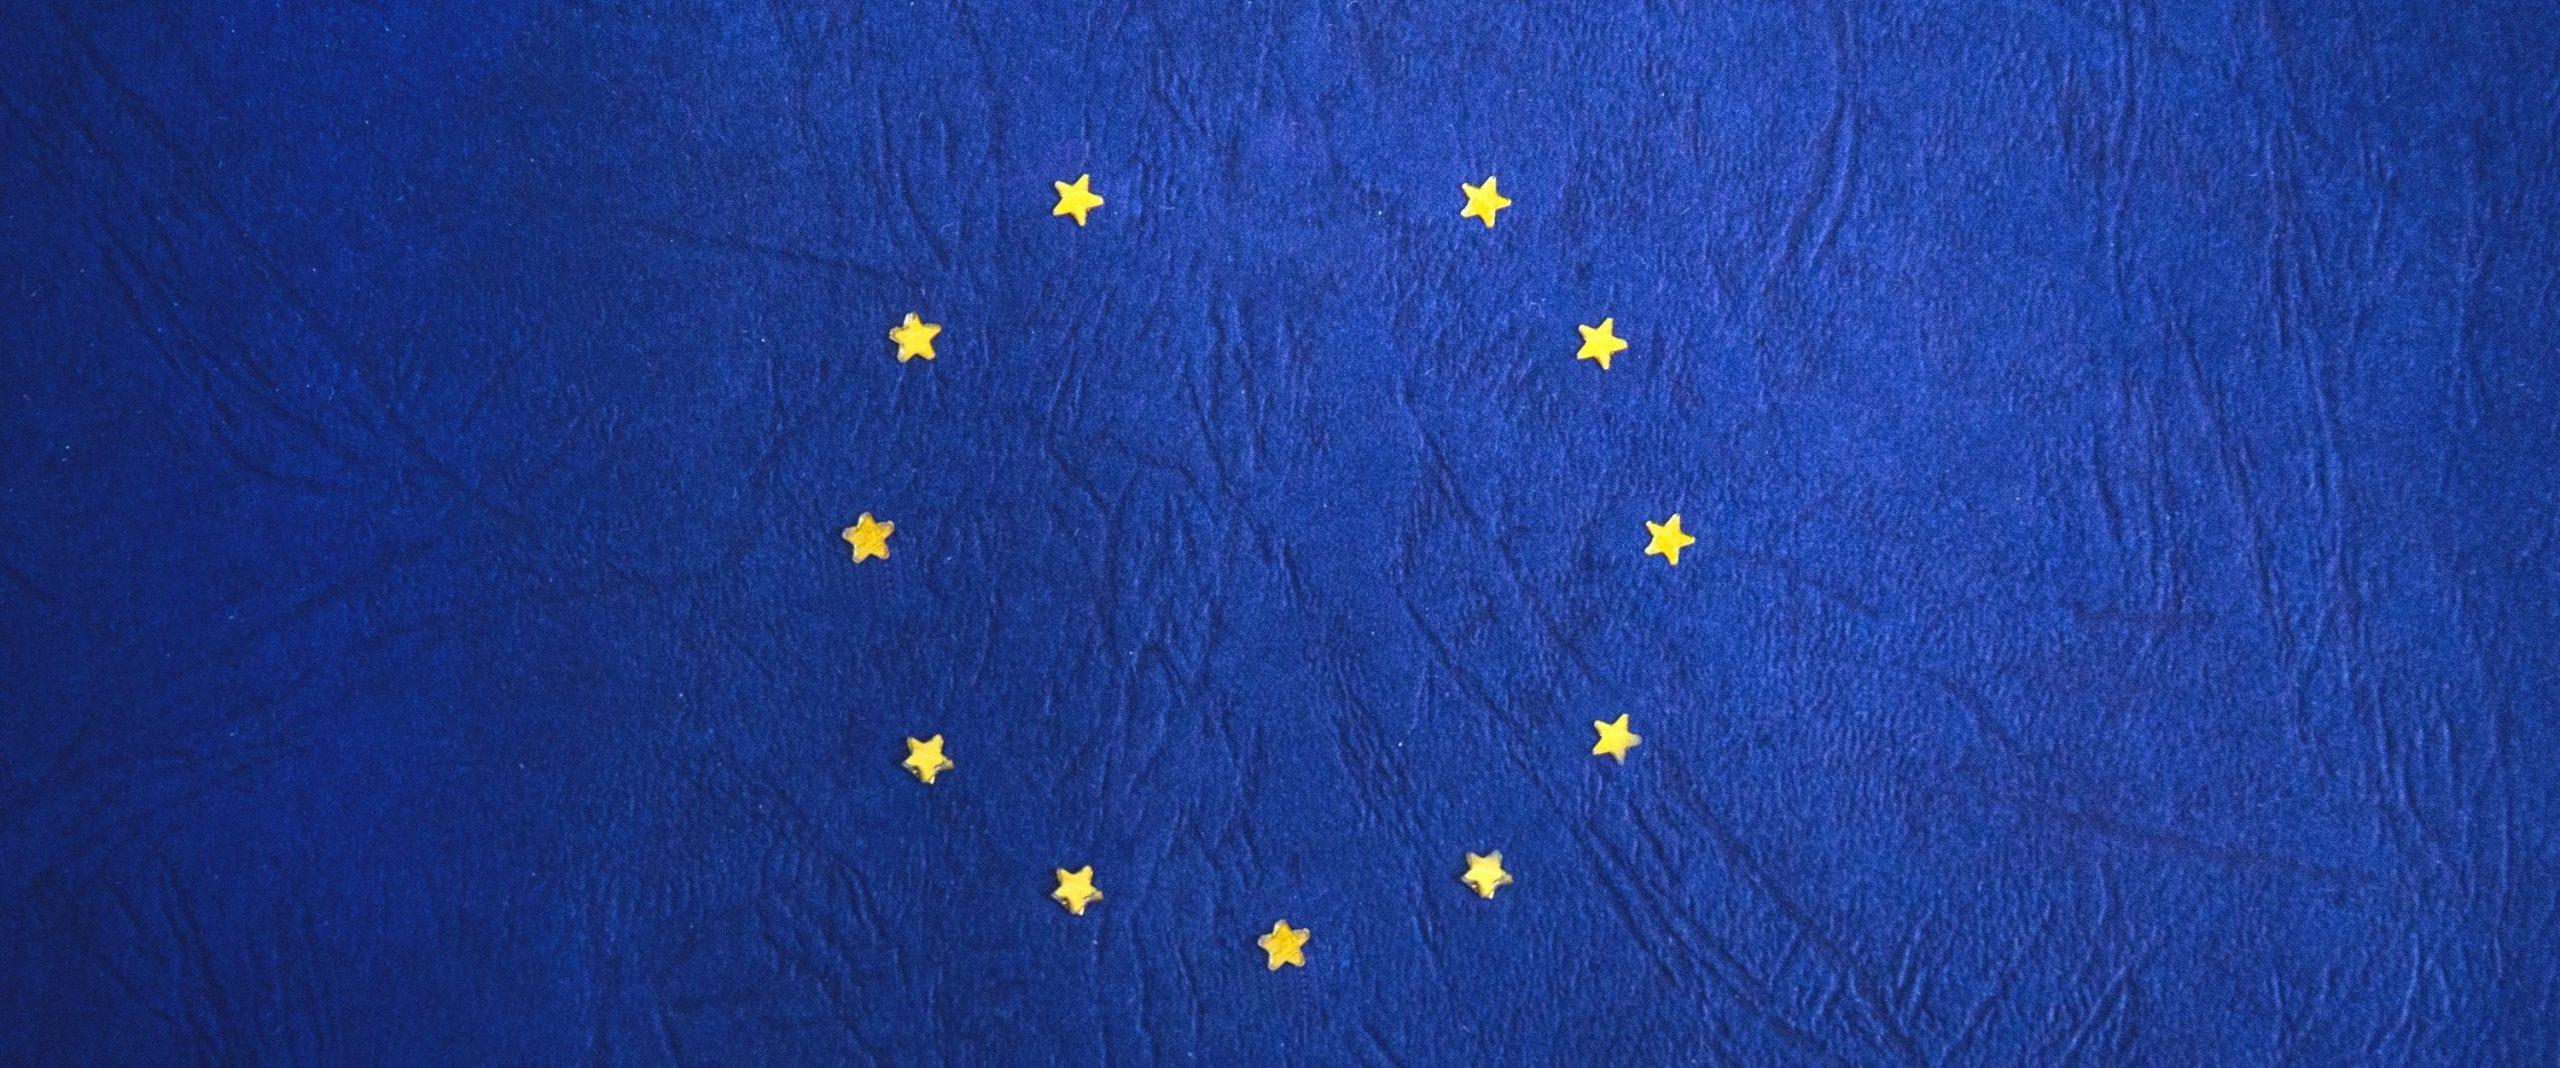 offene Europafahne